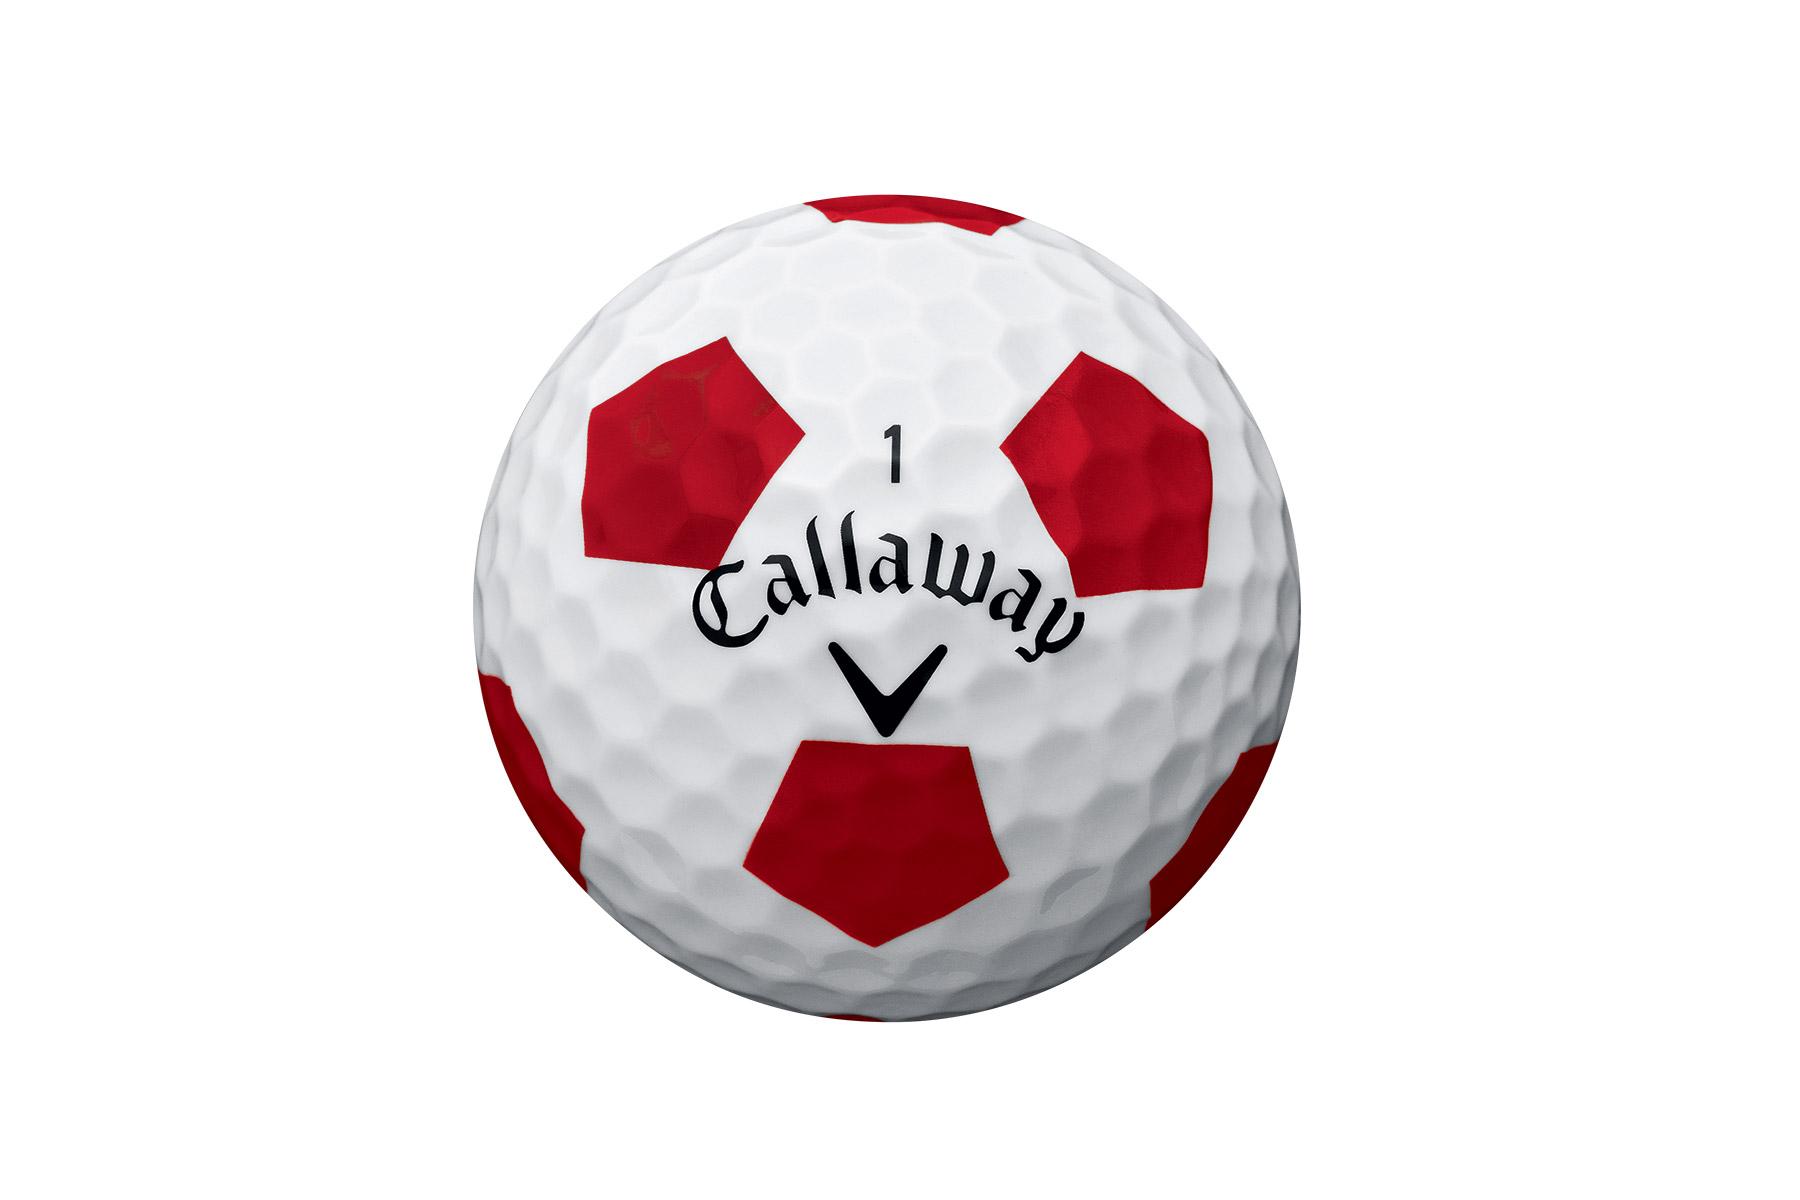 Callaway golf chrome soft truvis ball pack from